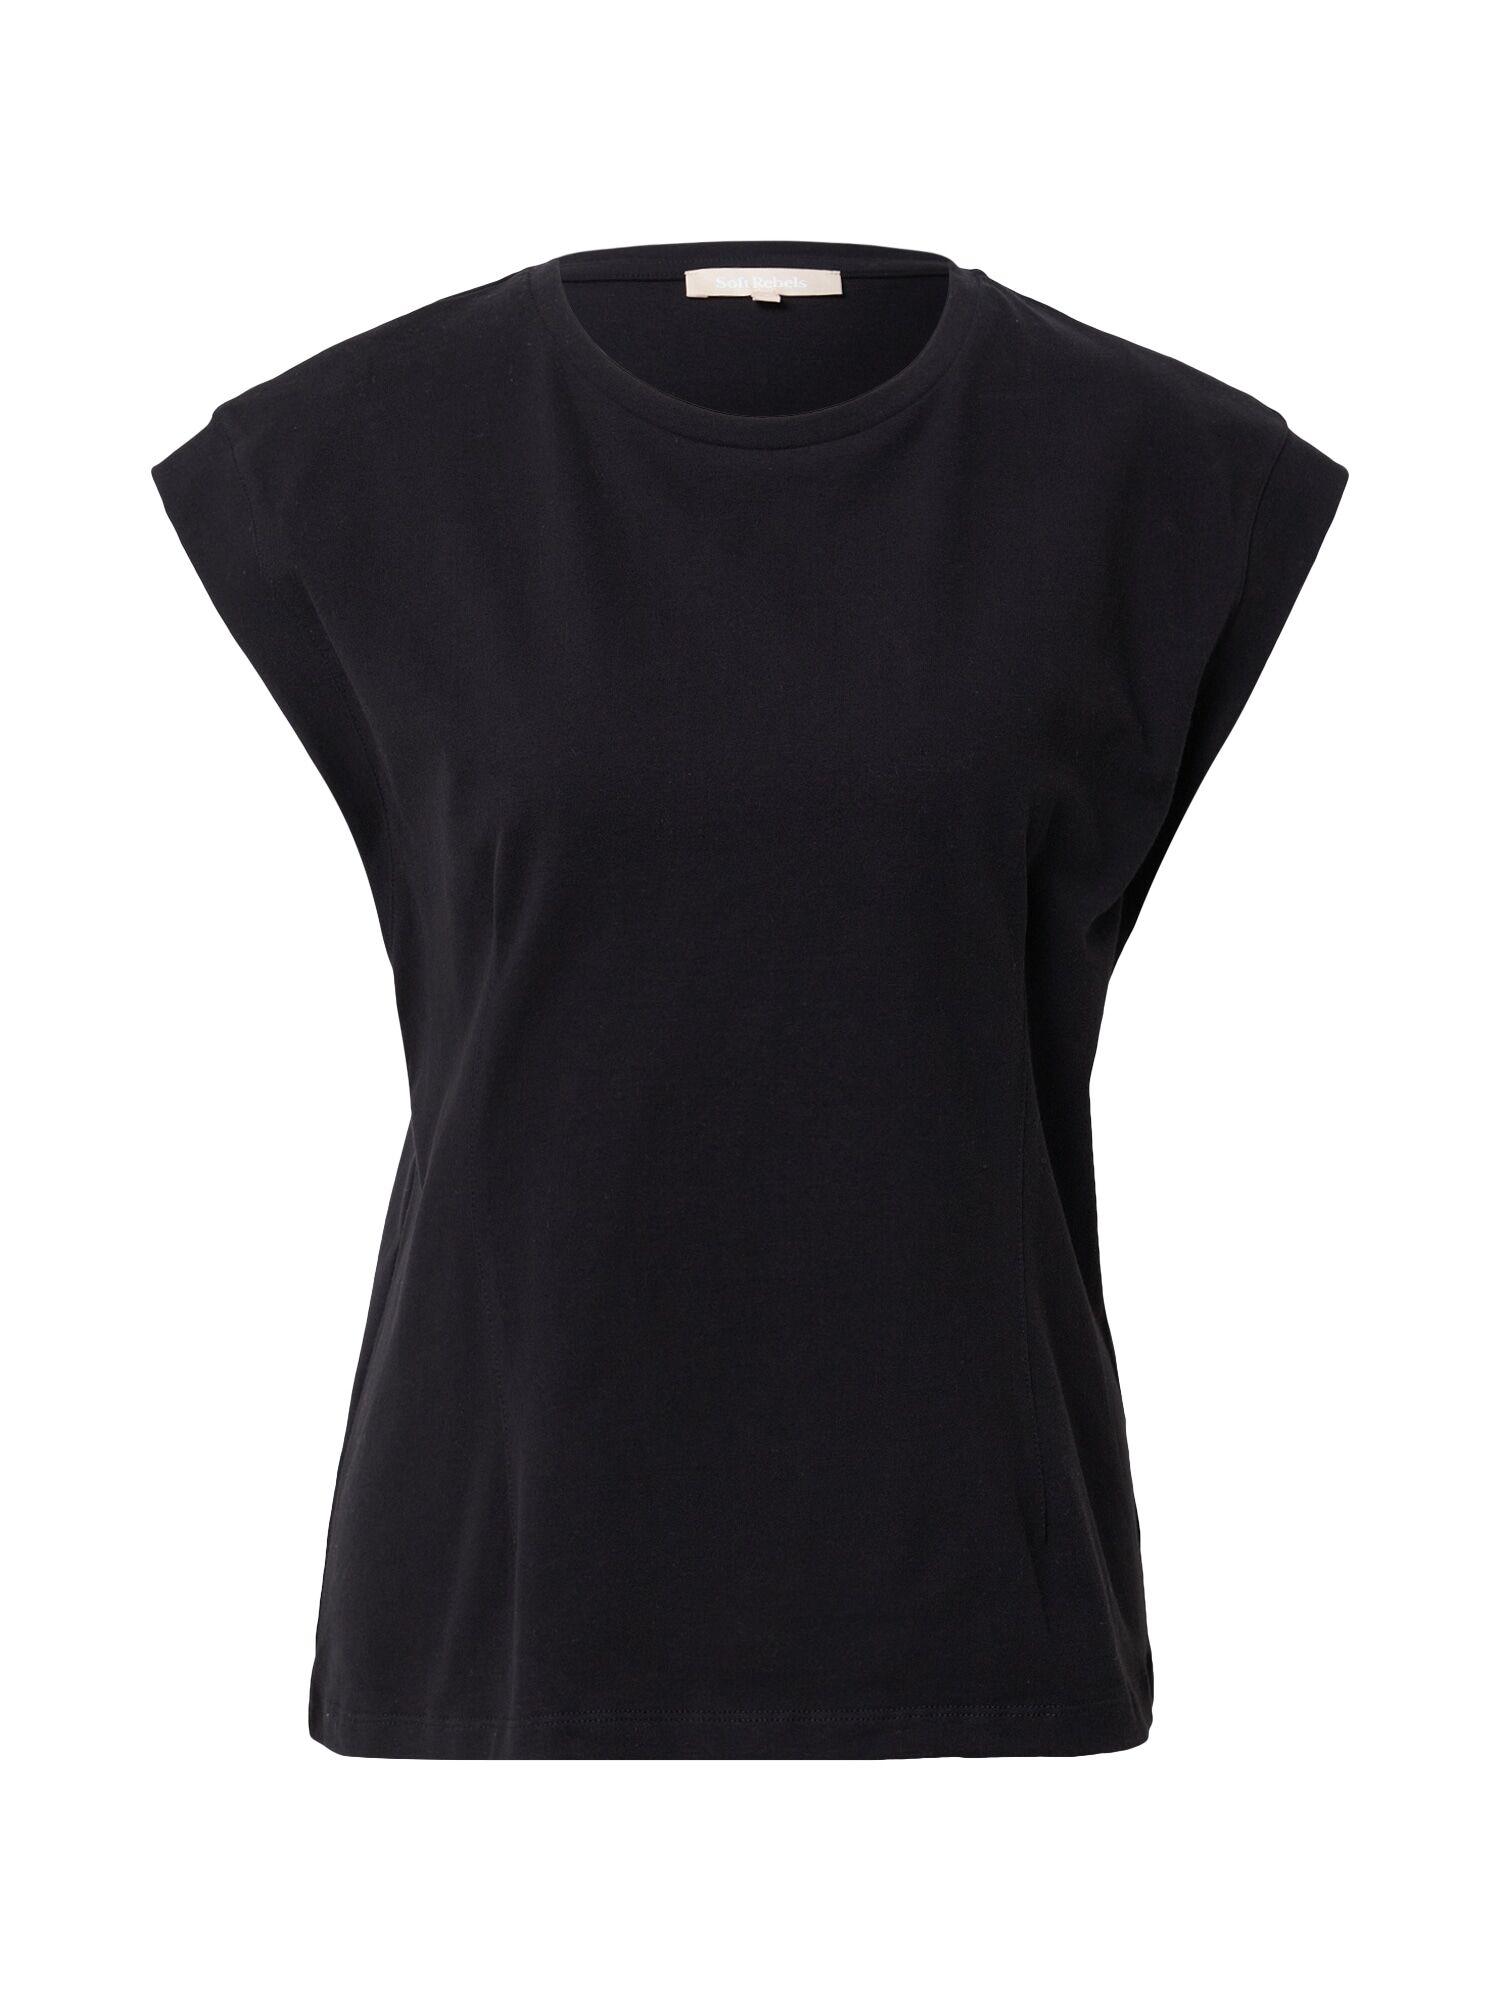 Soft Rebels T-shirt 'Winona'  - Noir - Taille: L - female